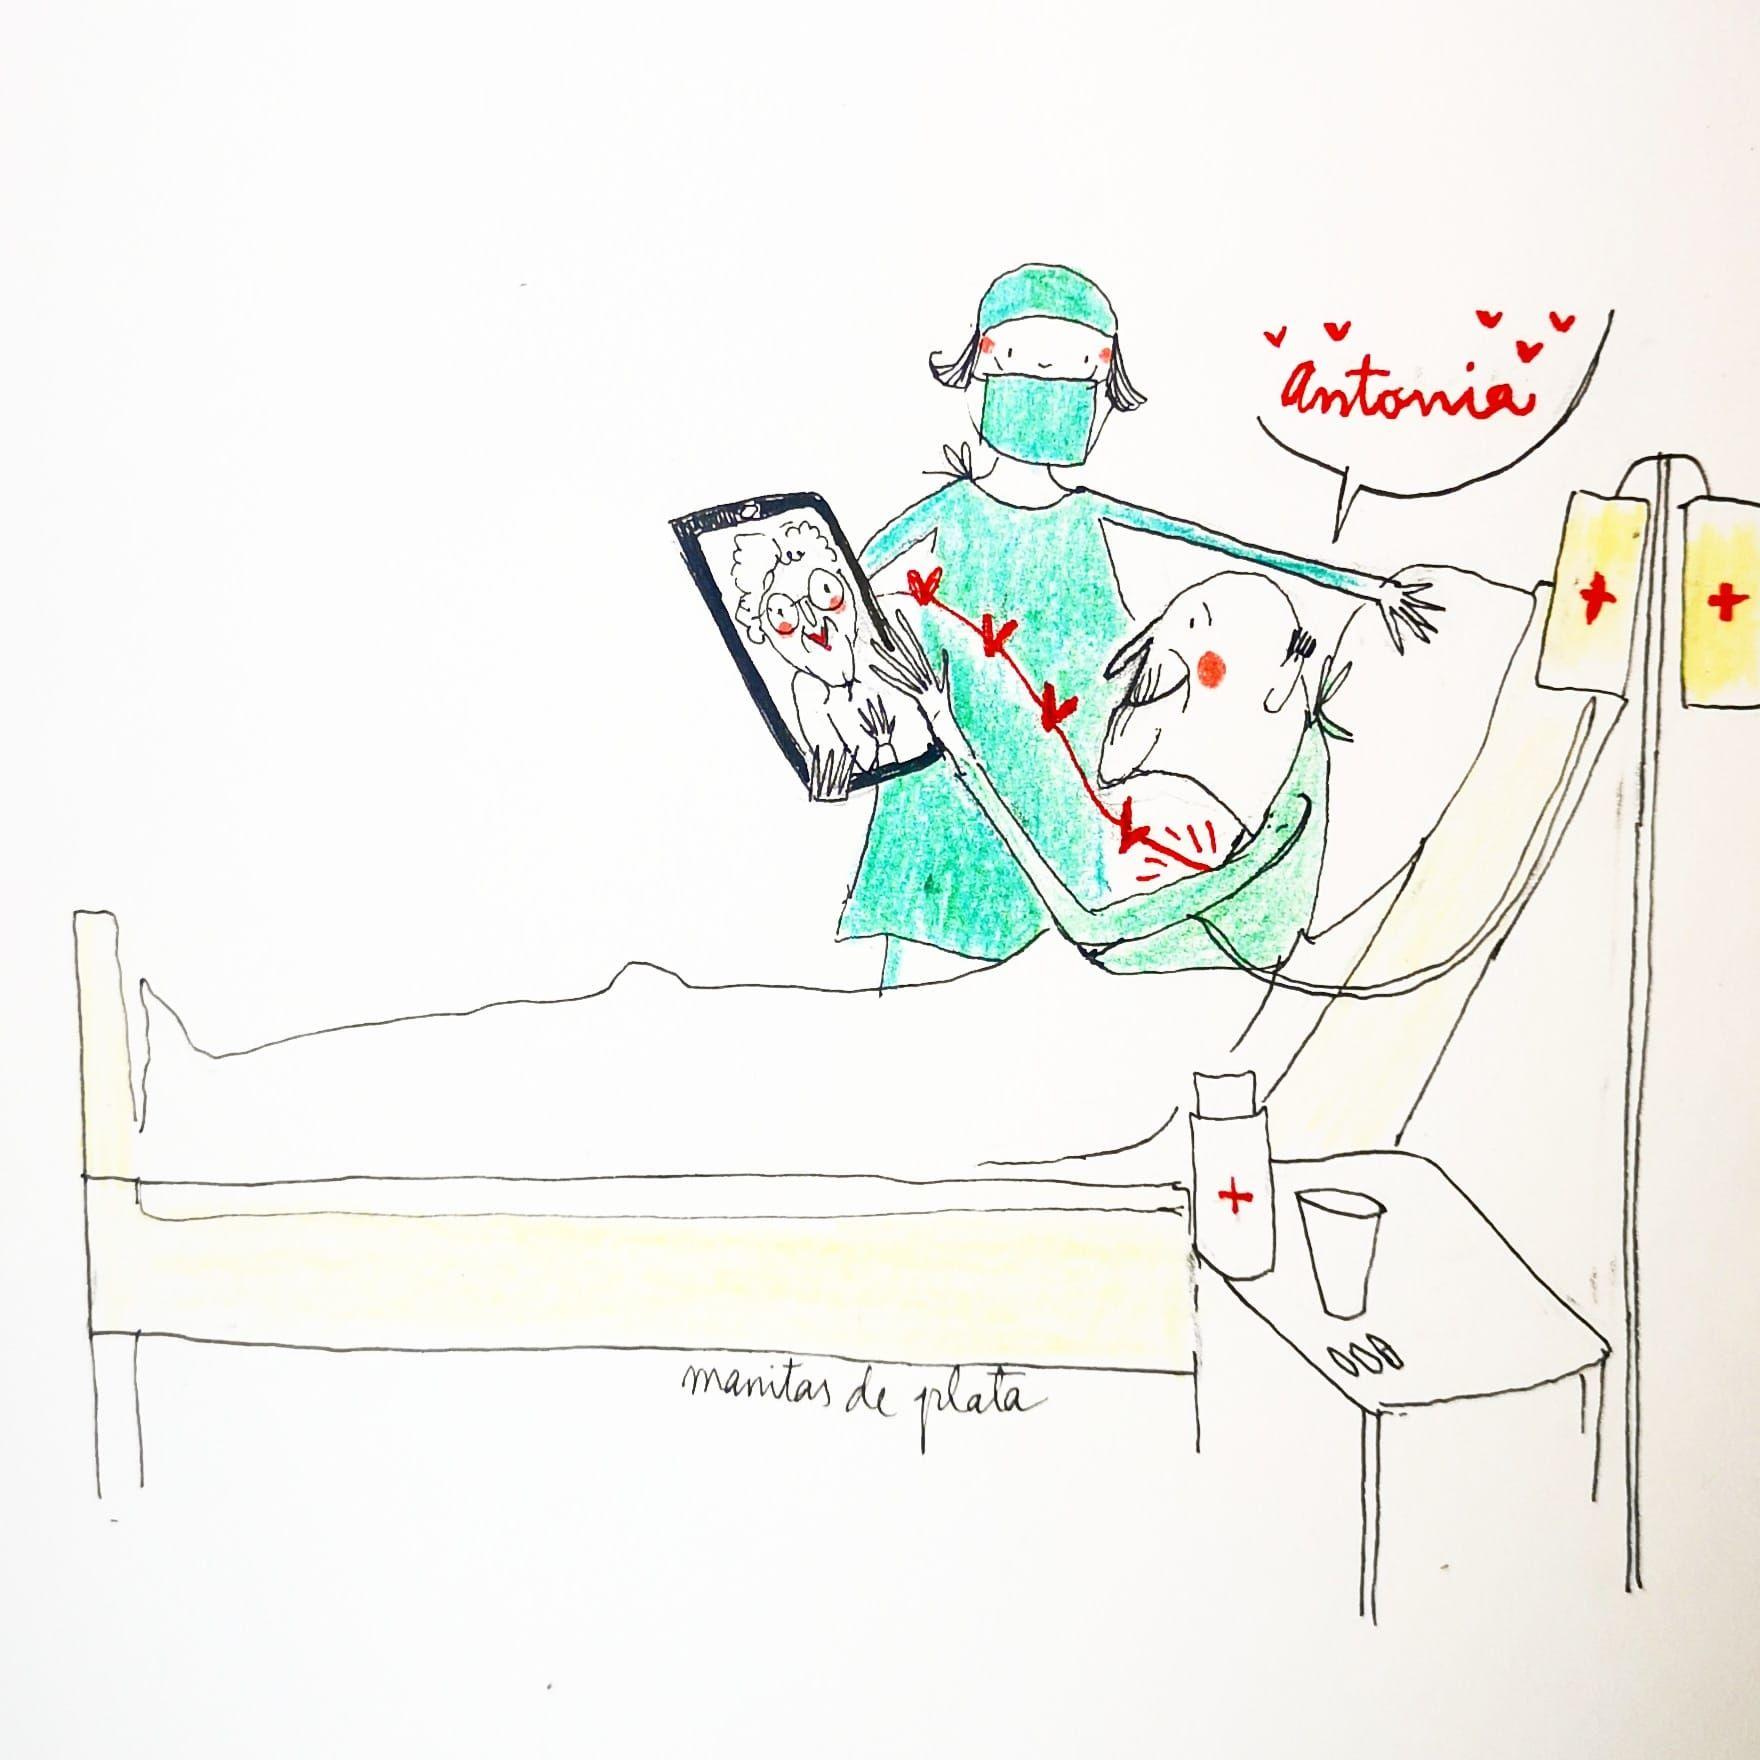 La pandemia bajo la mirada de Marina Puche